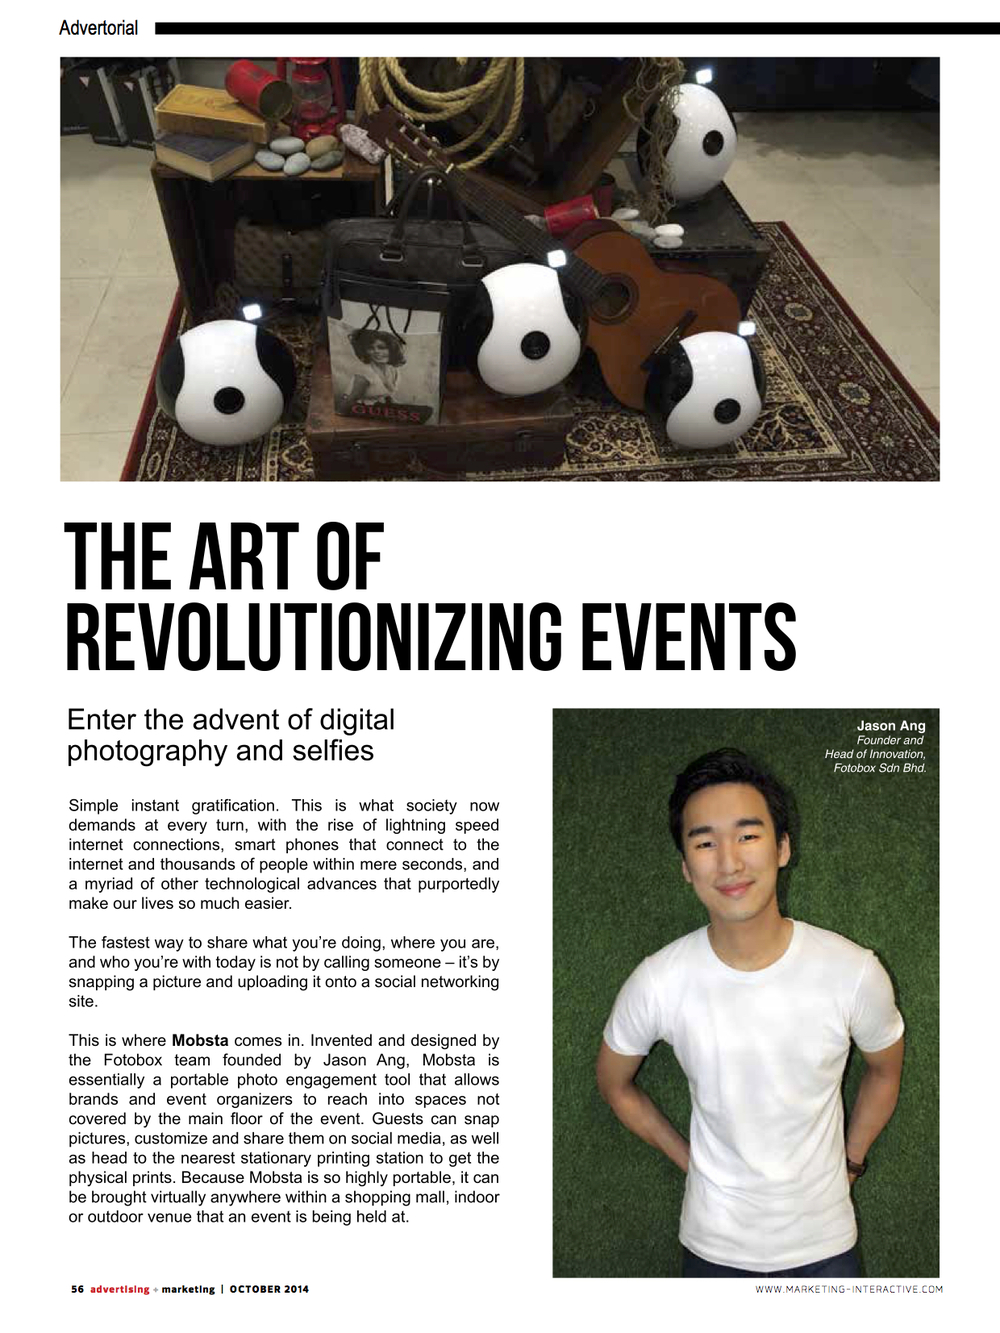 Fotobox Dec 2014 Editiorial (A+M Malaysia Magazine).jpg